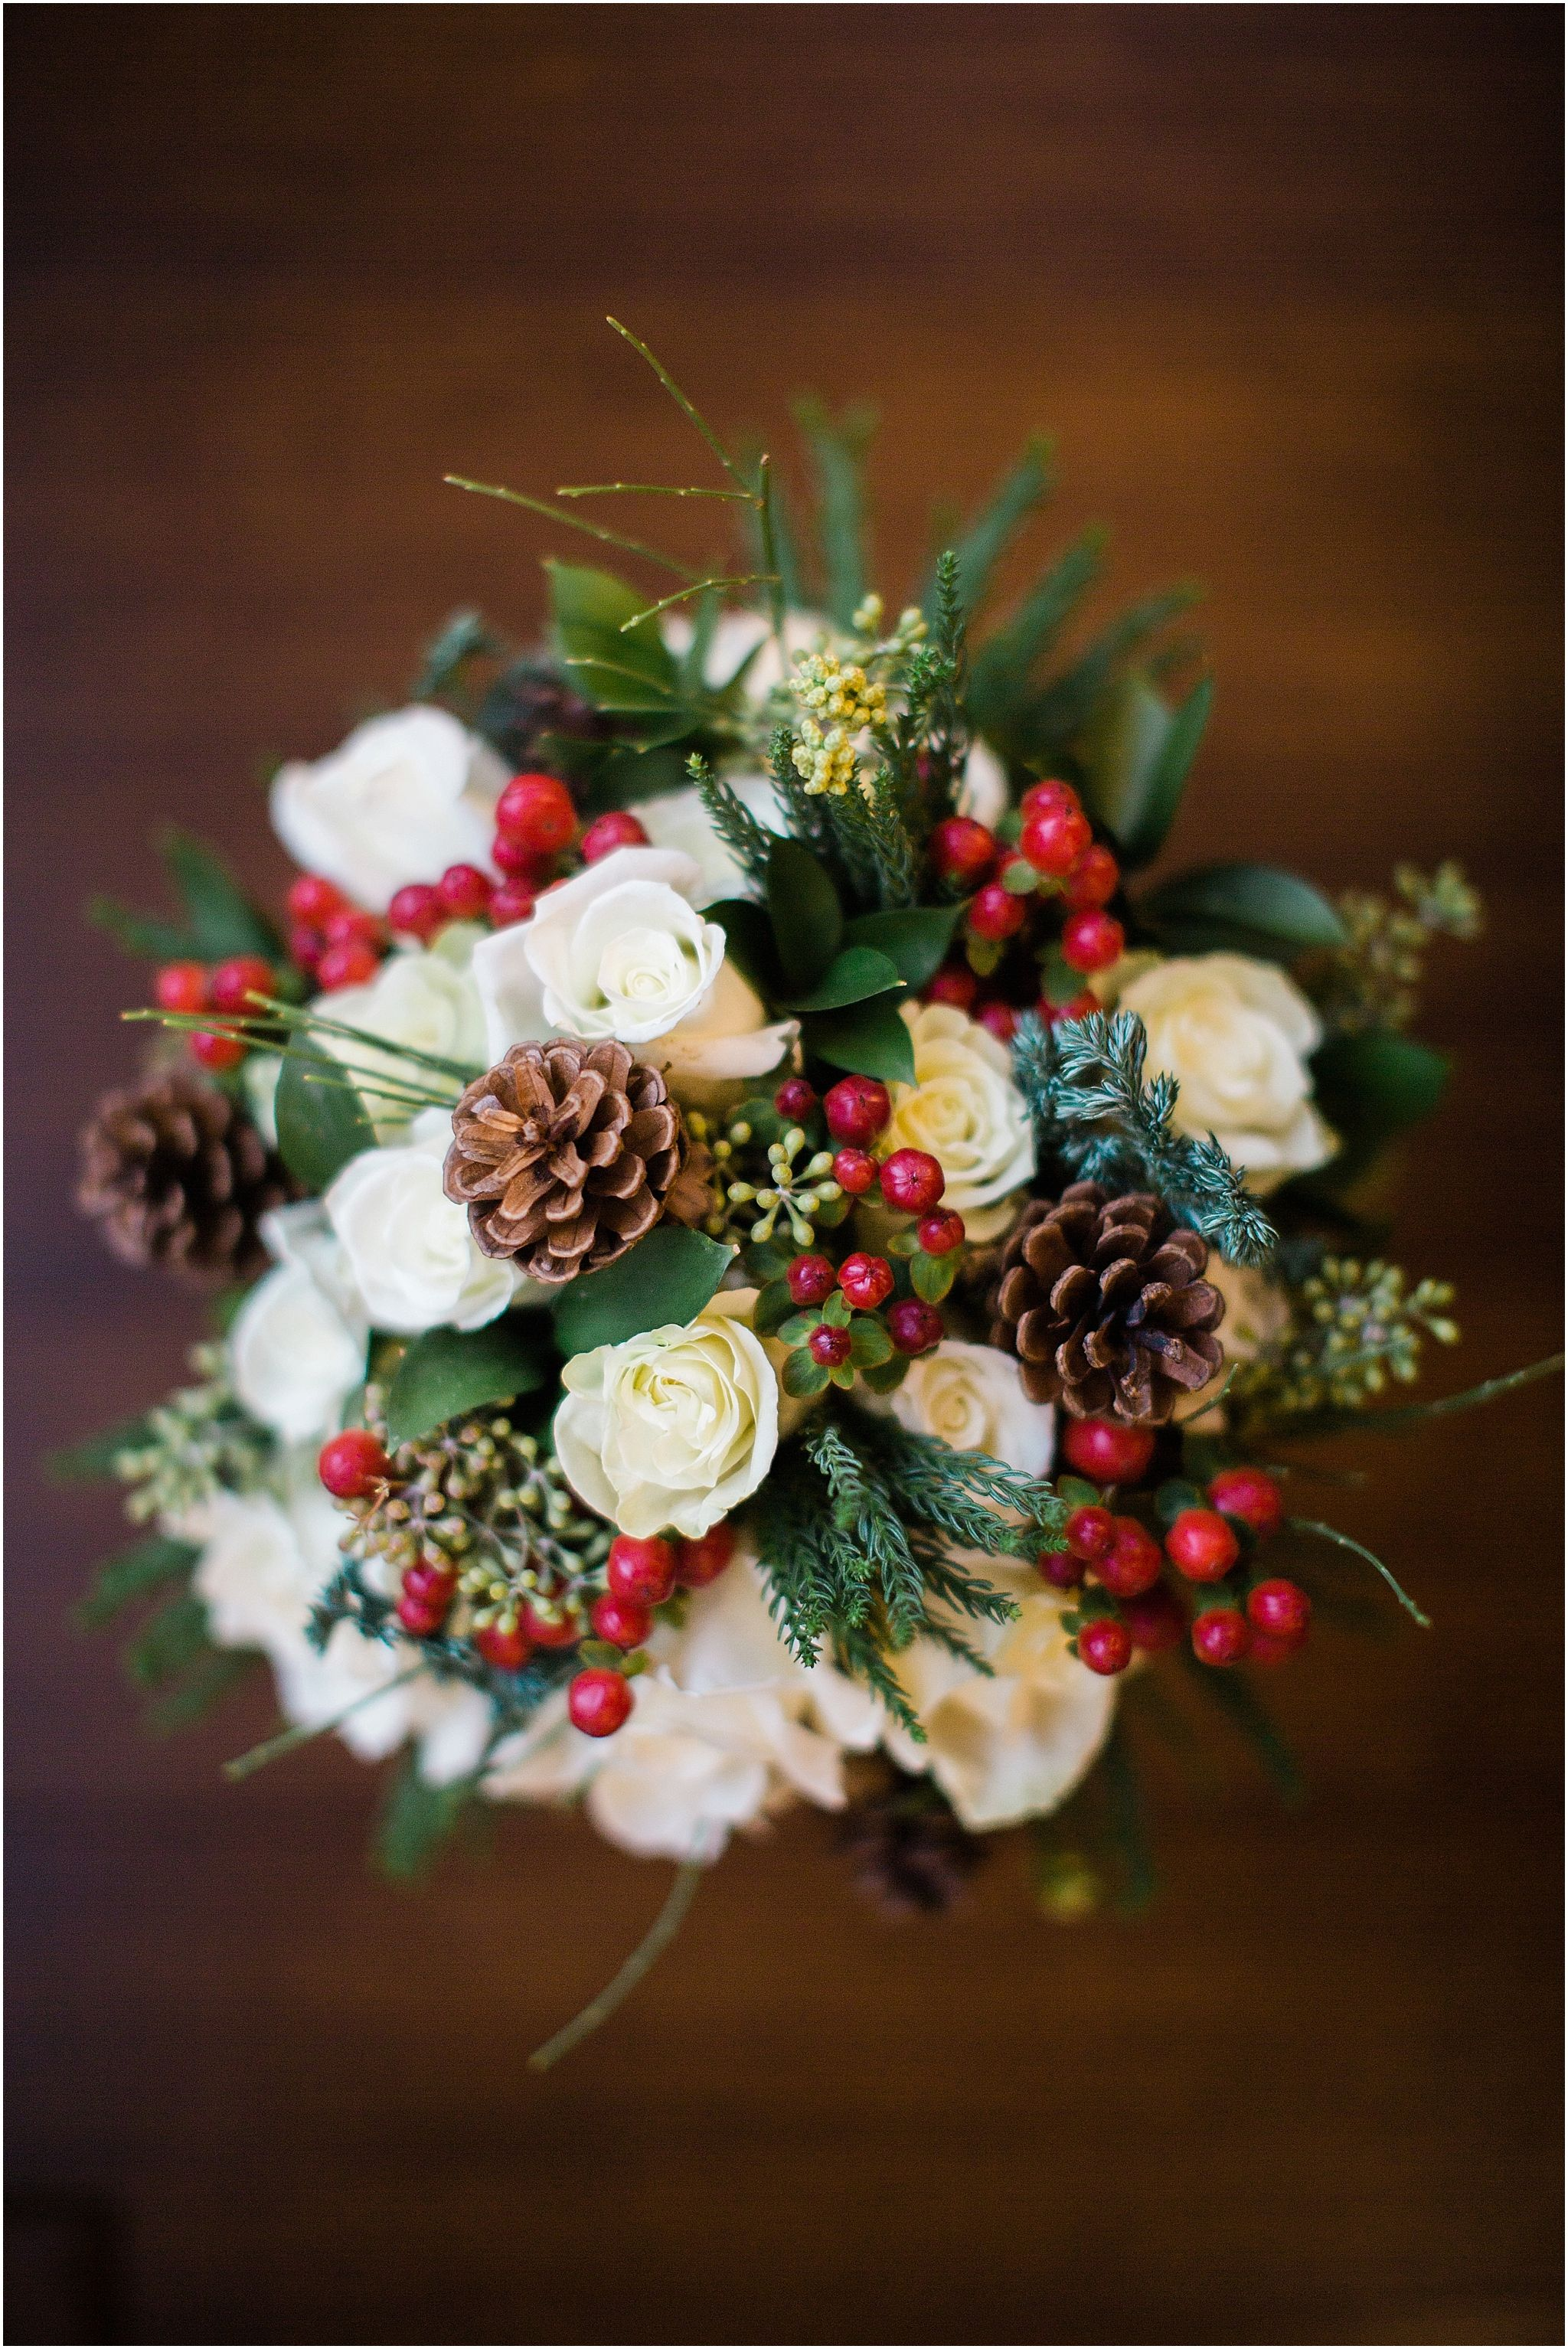 Bouquet Natalizio Matrimonio : Bouquet invernale natale in bouquet matrimonio bouquet